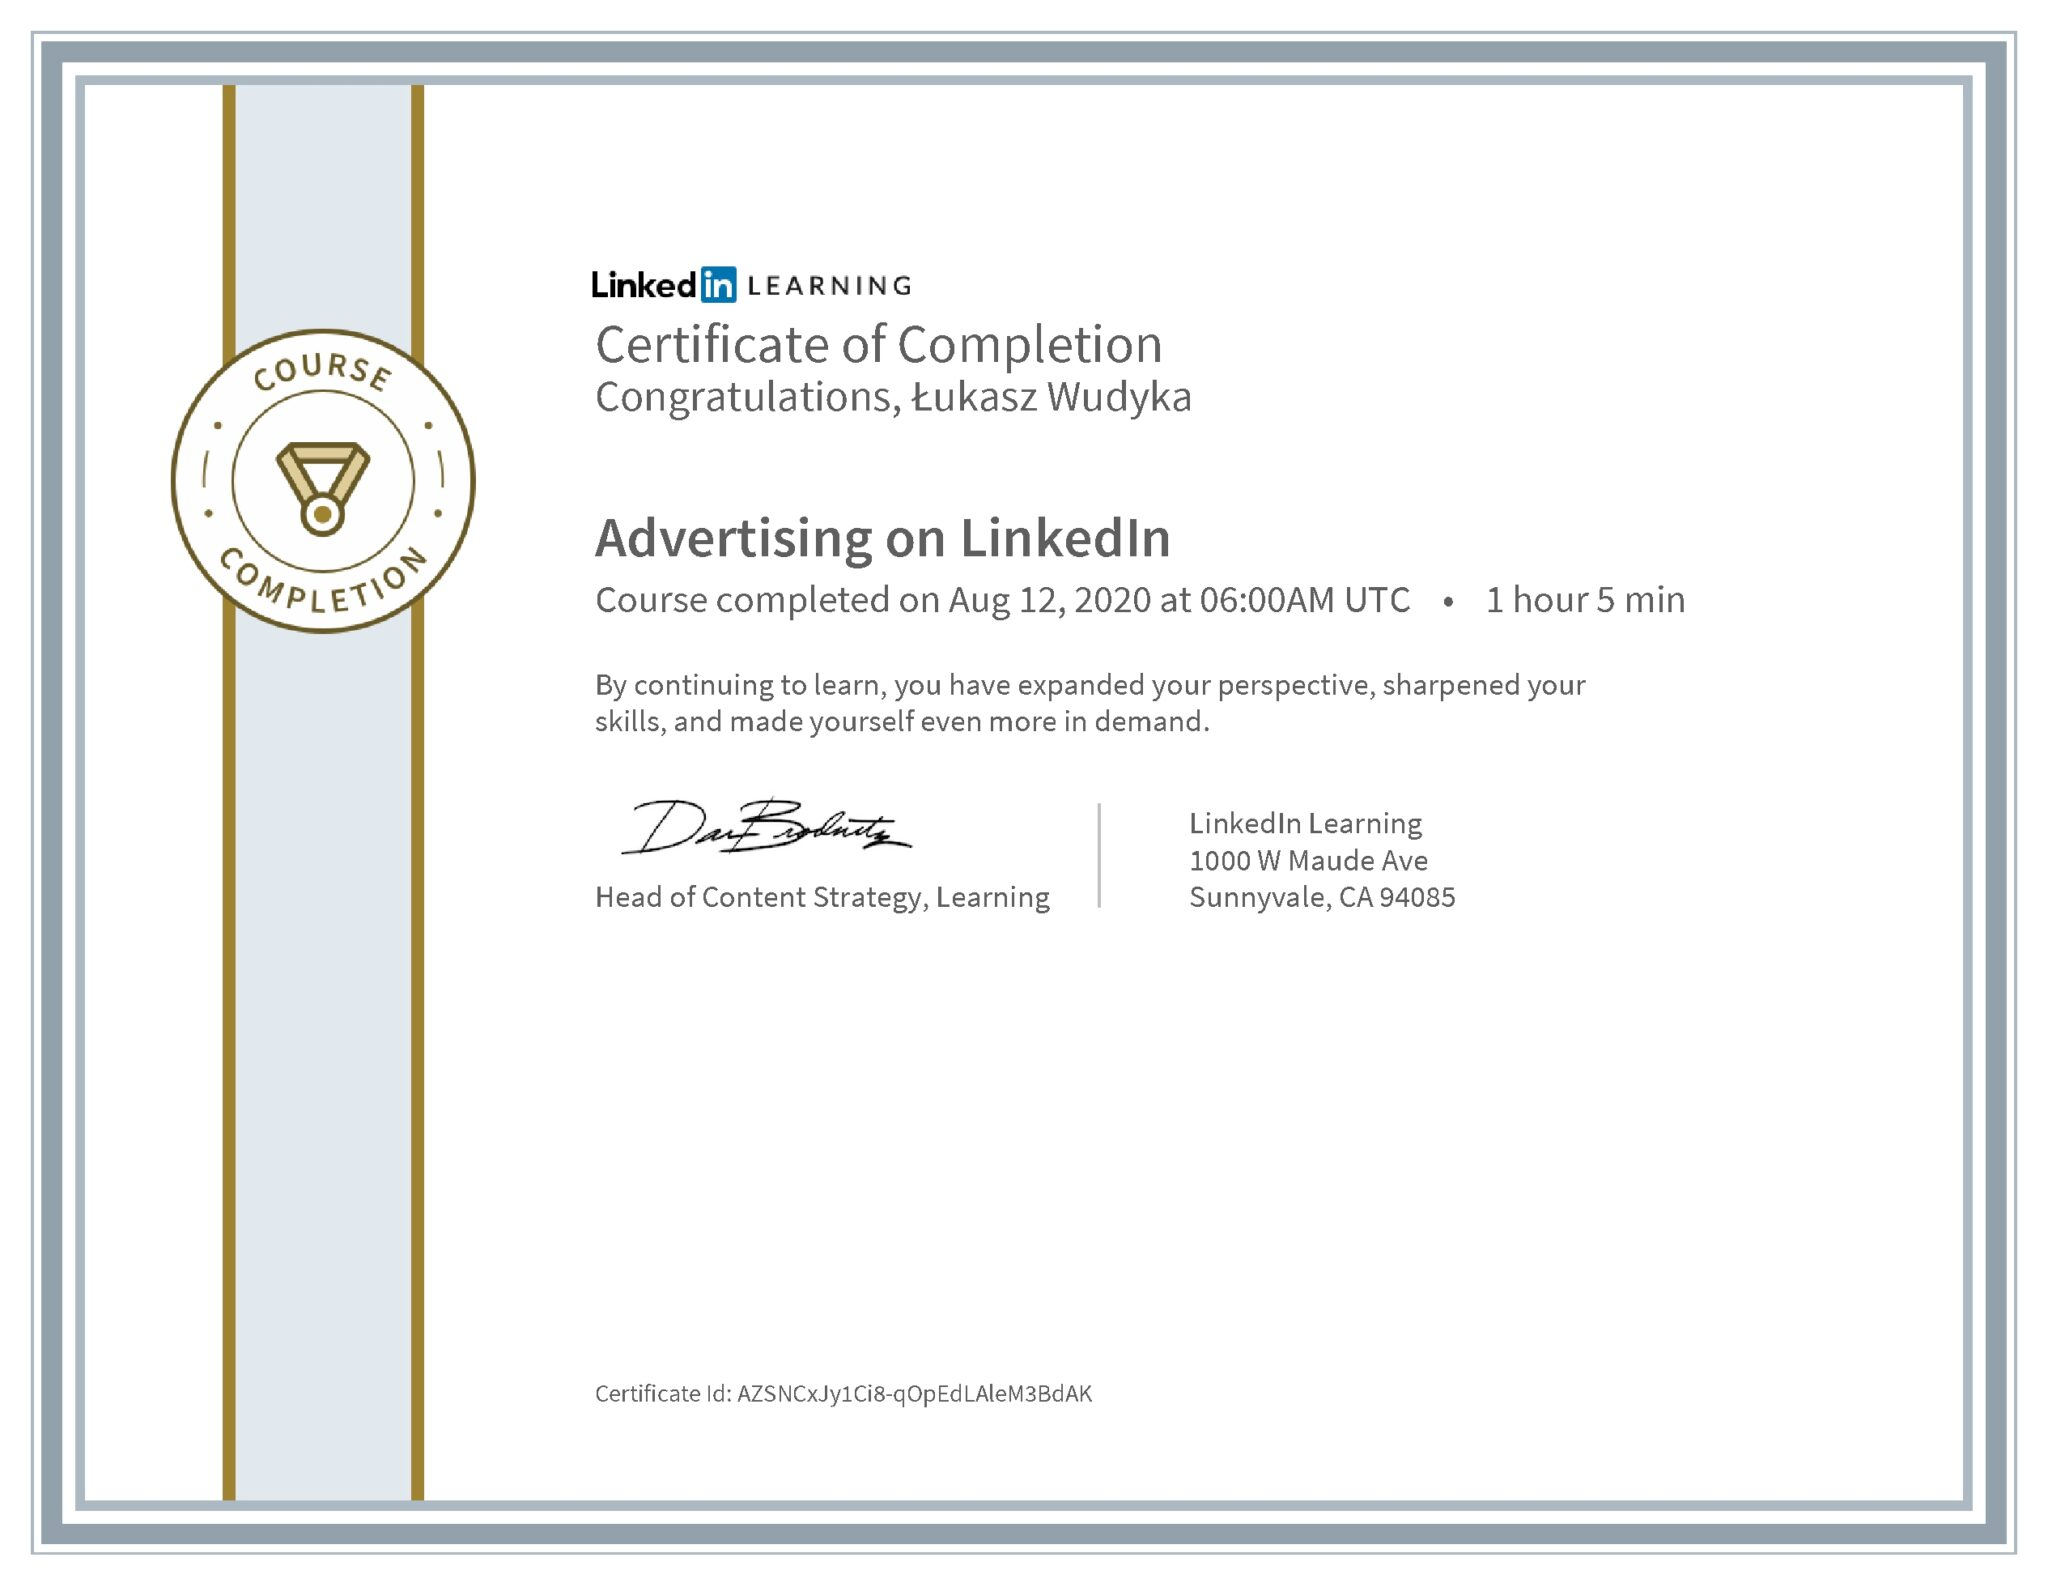 Łukasz Wudyka certyfikat LinkedIn Advertising on LinkedIn